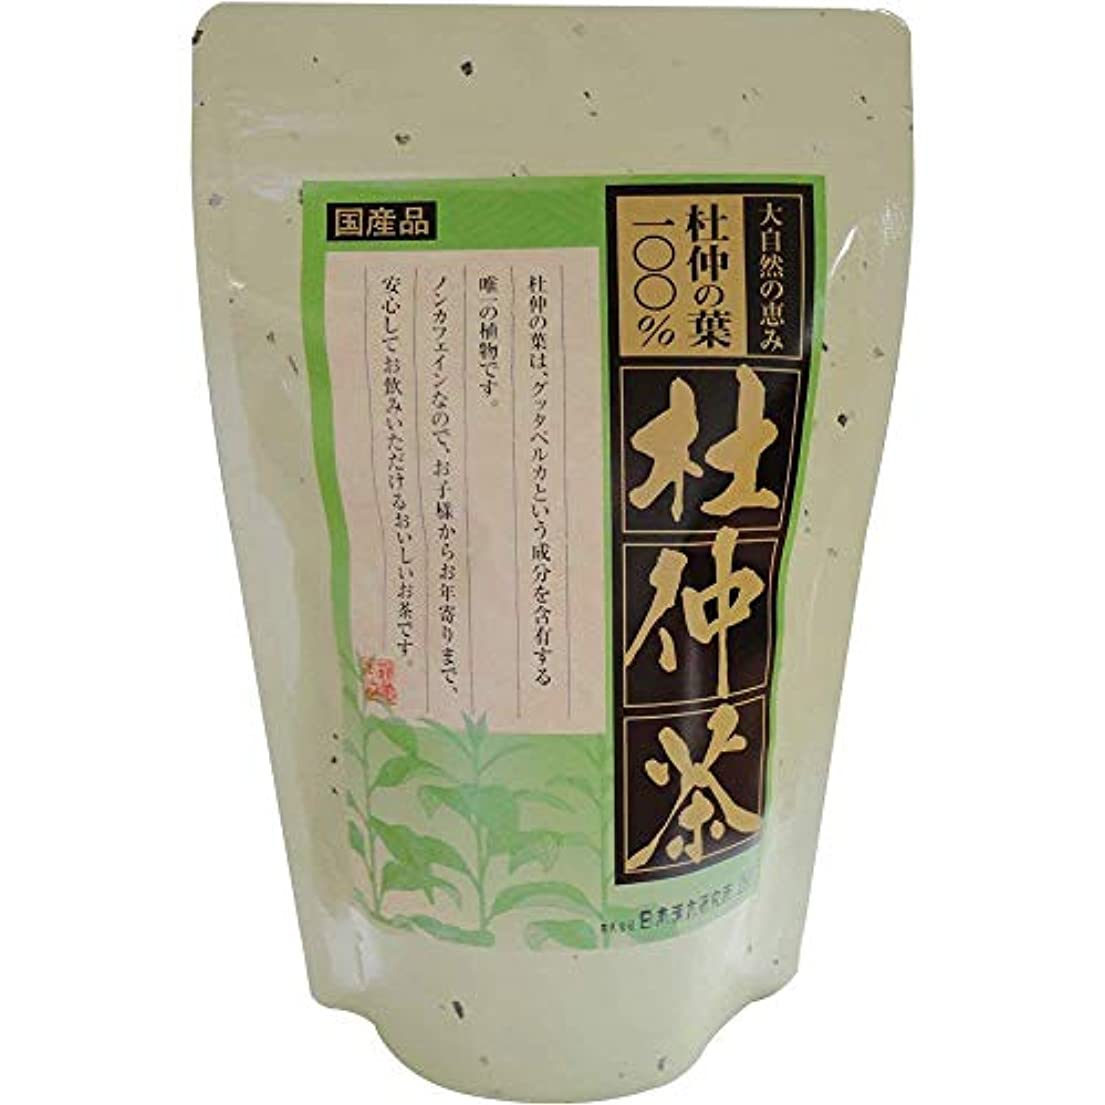 不一致手伝う学部杜仲茶100%(国産品) 2g×30包入 2個セット